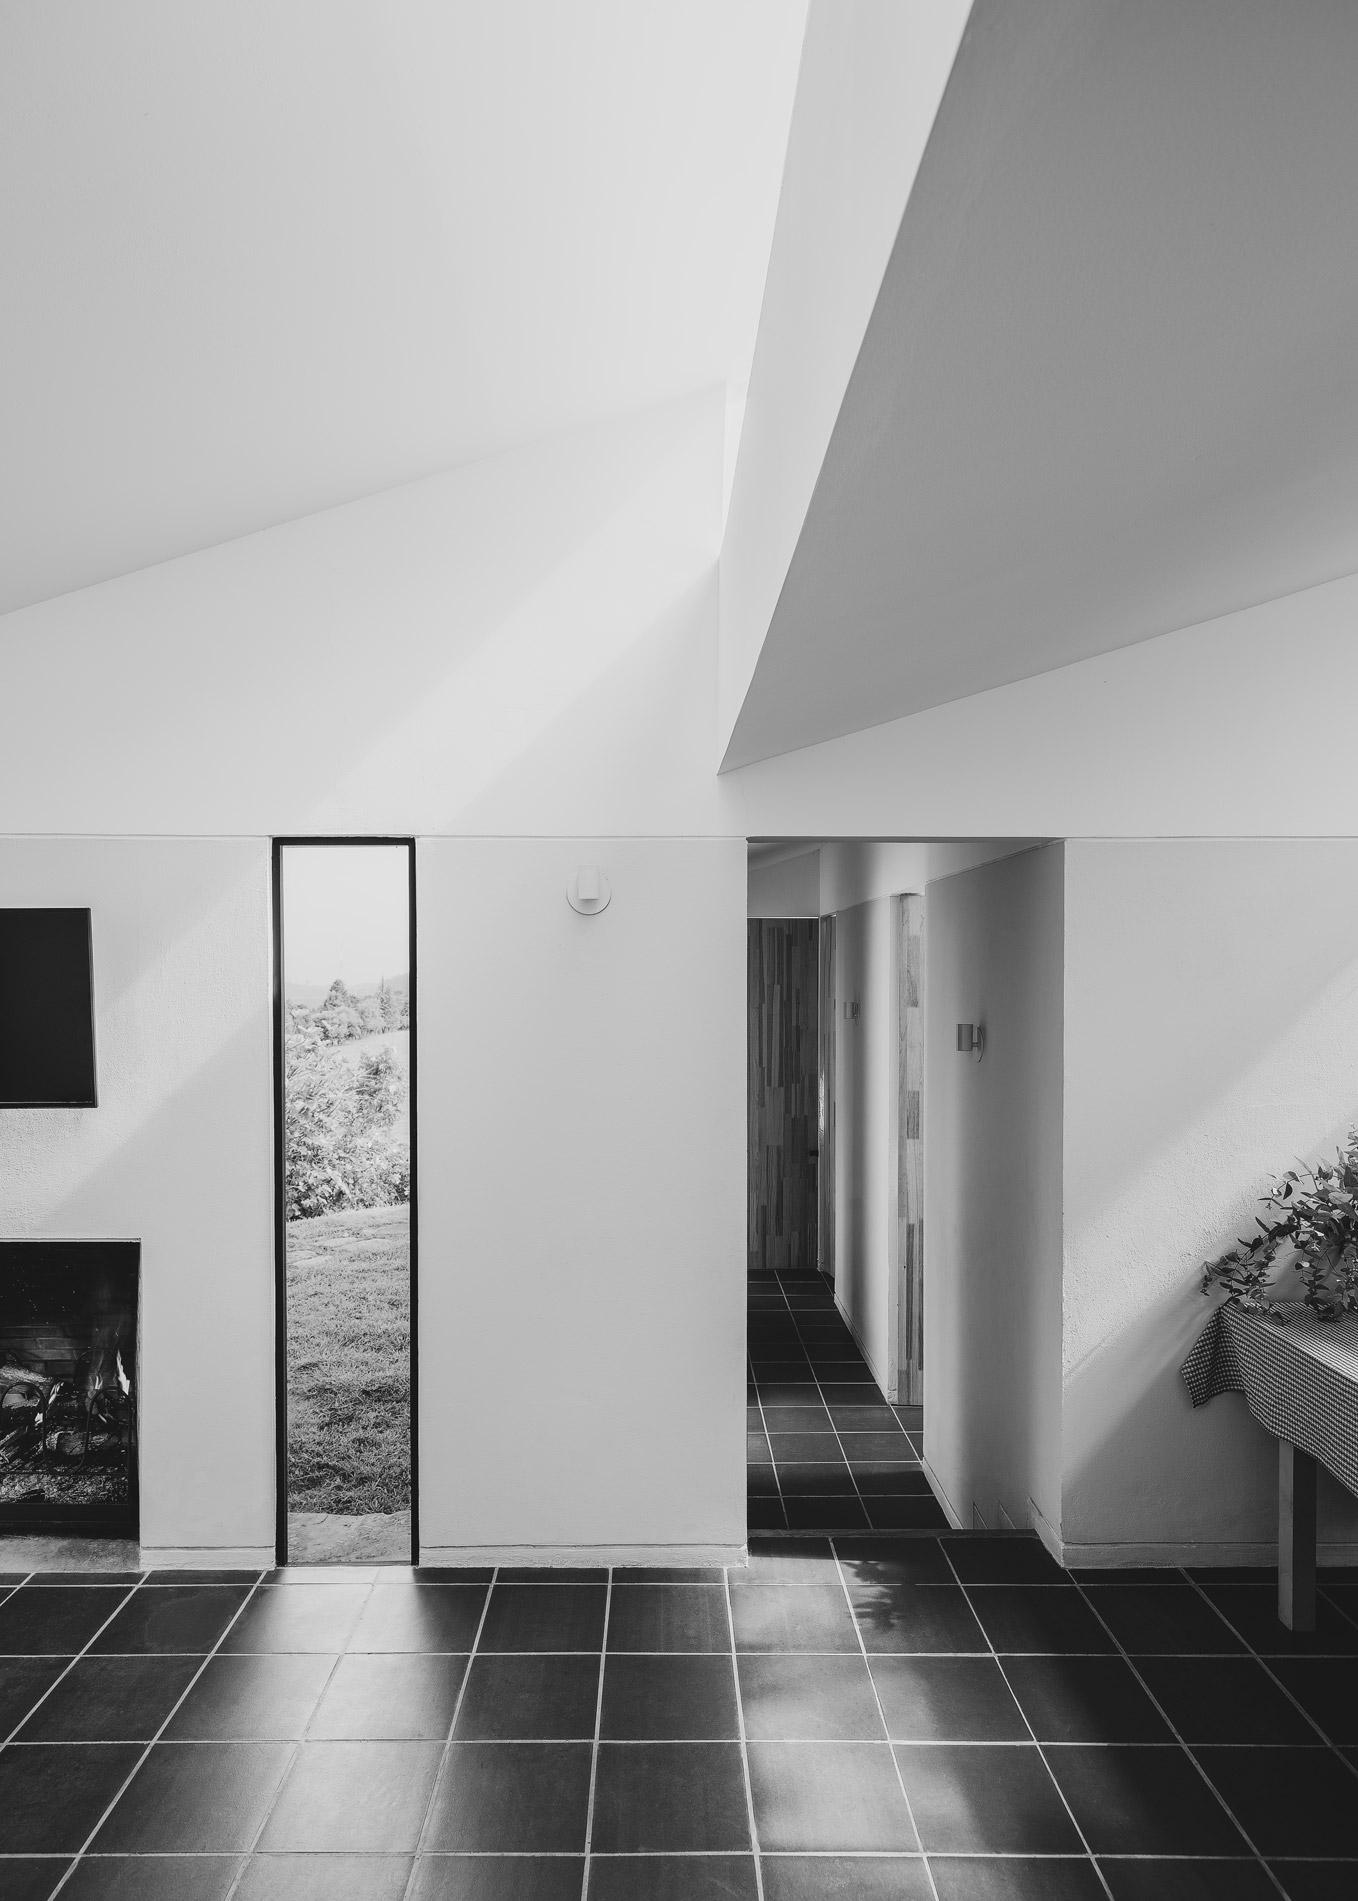 10-oberleander.lucas.simon.bosch.photography.colombia.bogota.arquitectura.diseño.fotografia